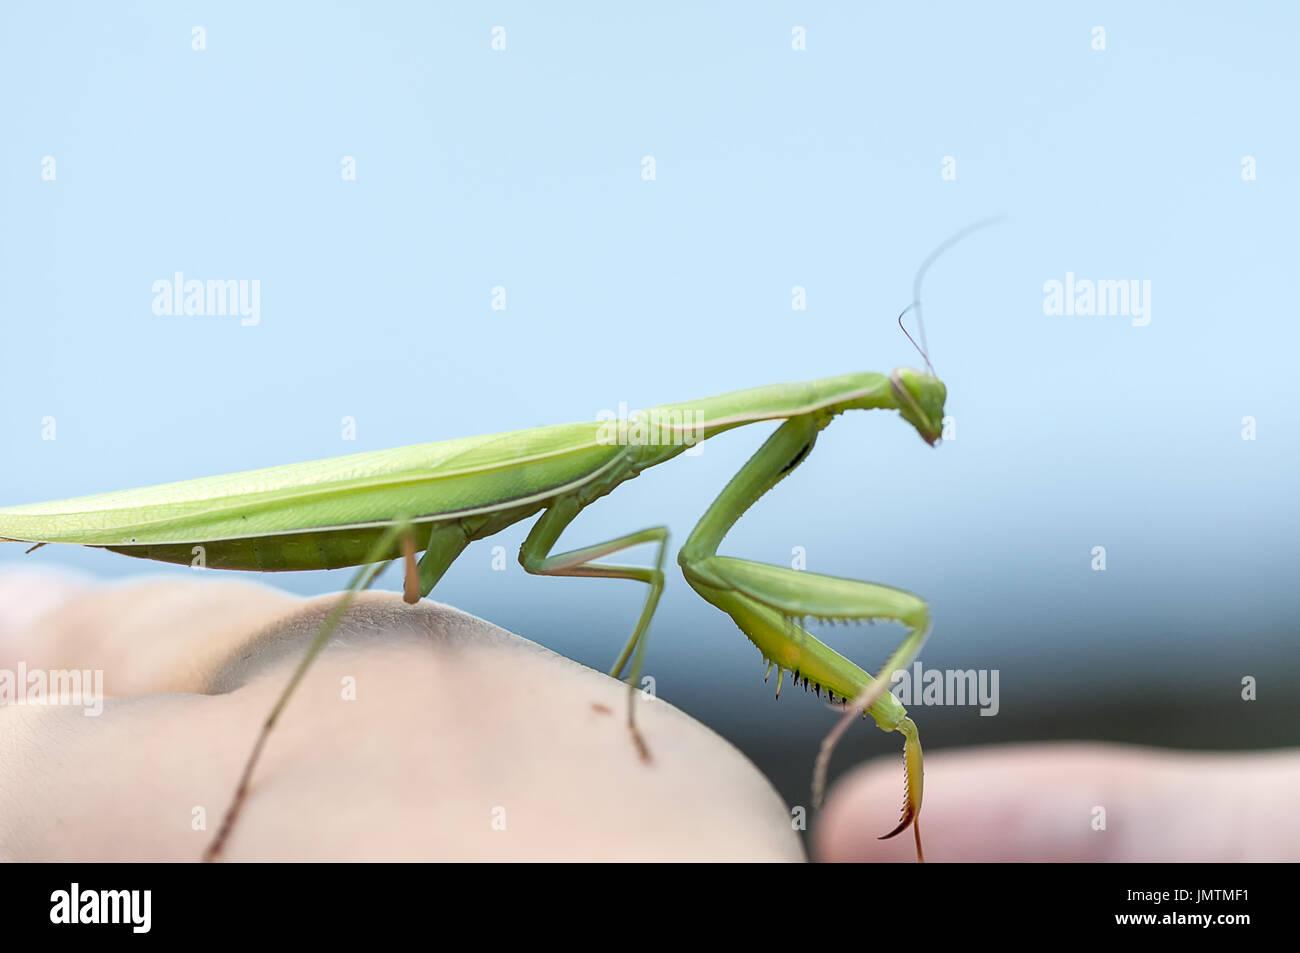 Closeup of a Praying Mantis. Shallow depth of field. - Stock Image